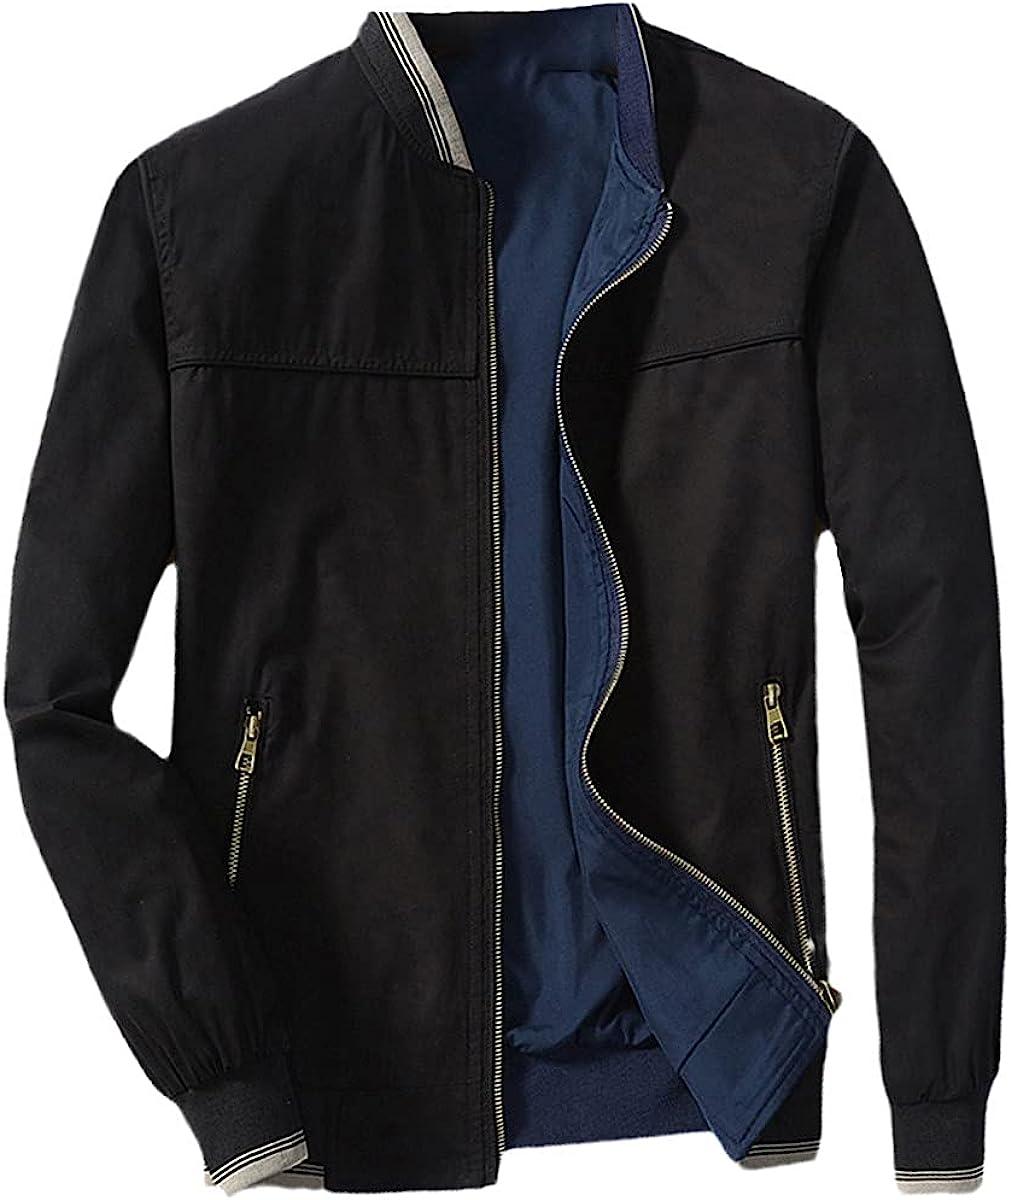 Spring Men's Bomber Jacket Casual Windbreaker Stand Collar Double-Sided Wear Jacket Baseball Uniform